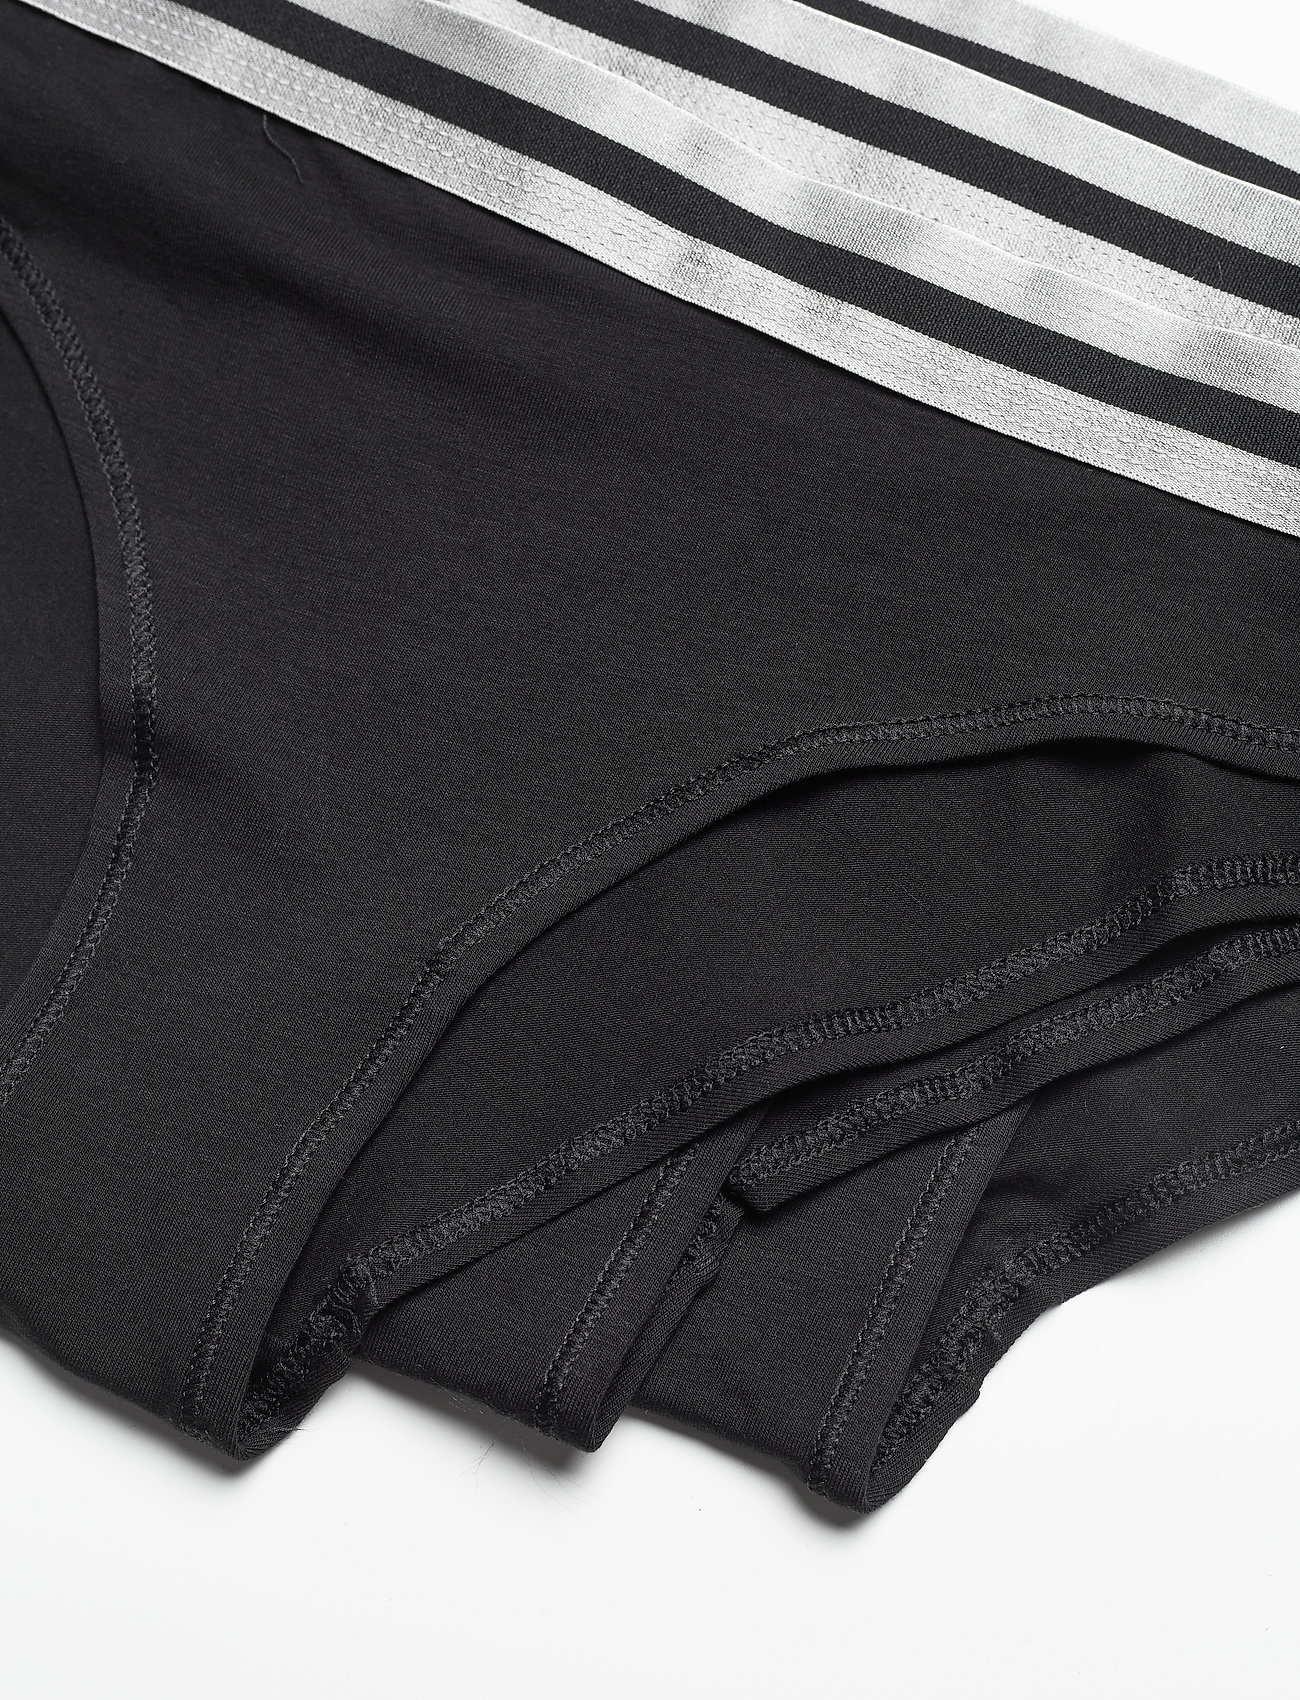 Danish Endurance - Organic Cotton Bikini Briefs by Pernille Blume 3 Pack - slips - black - 1